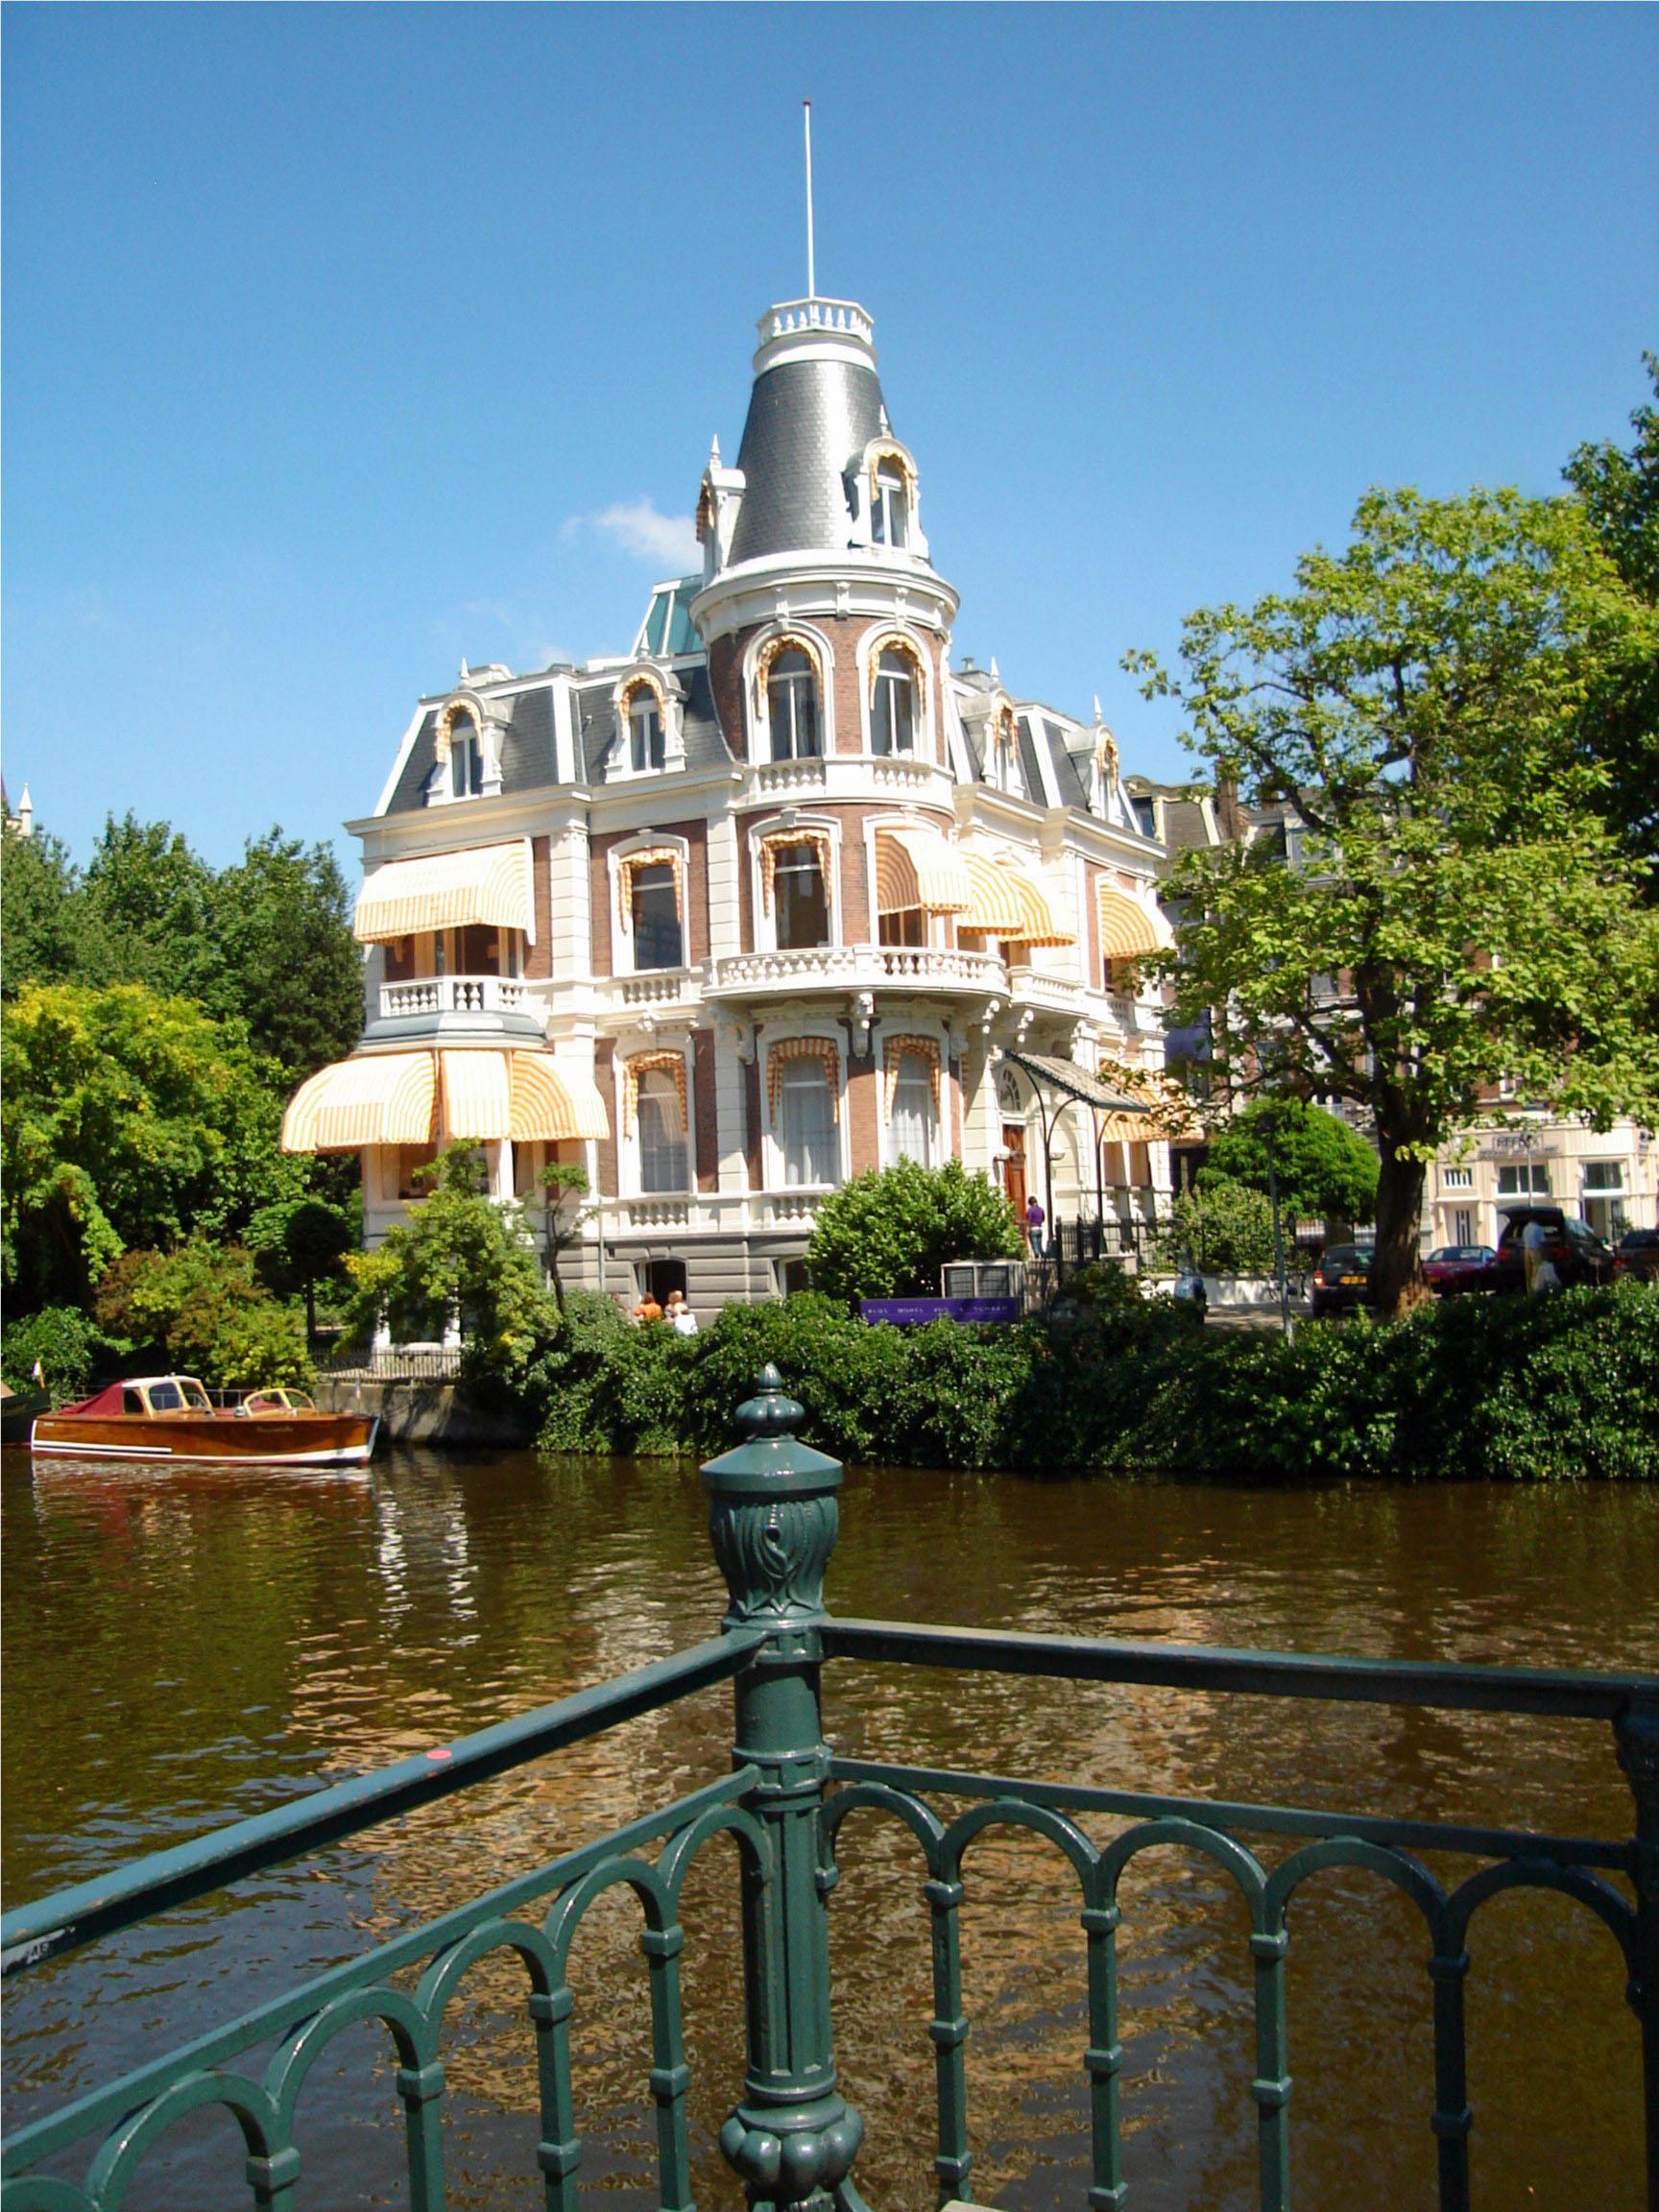 House on the gracht - Amsterdam, Holland